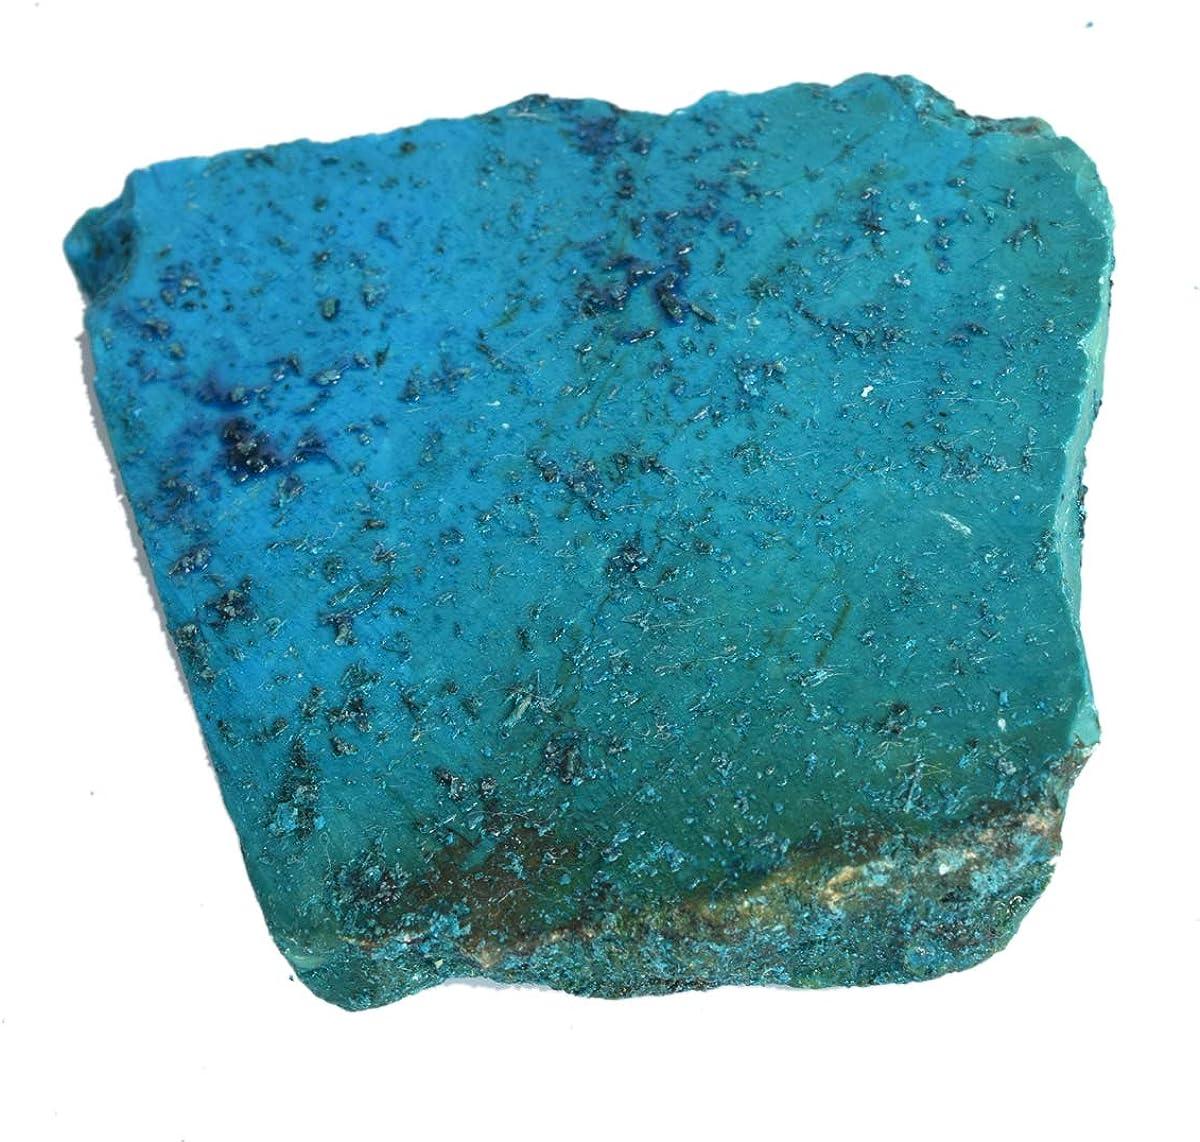 Gemhub Natural Raw Blue Turquoise Slab 1527.00 Ct Uncut Rough Healing Crystal Unheated Blue Turquoise Stone